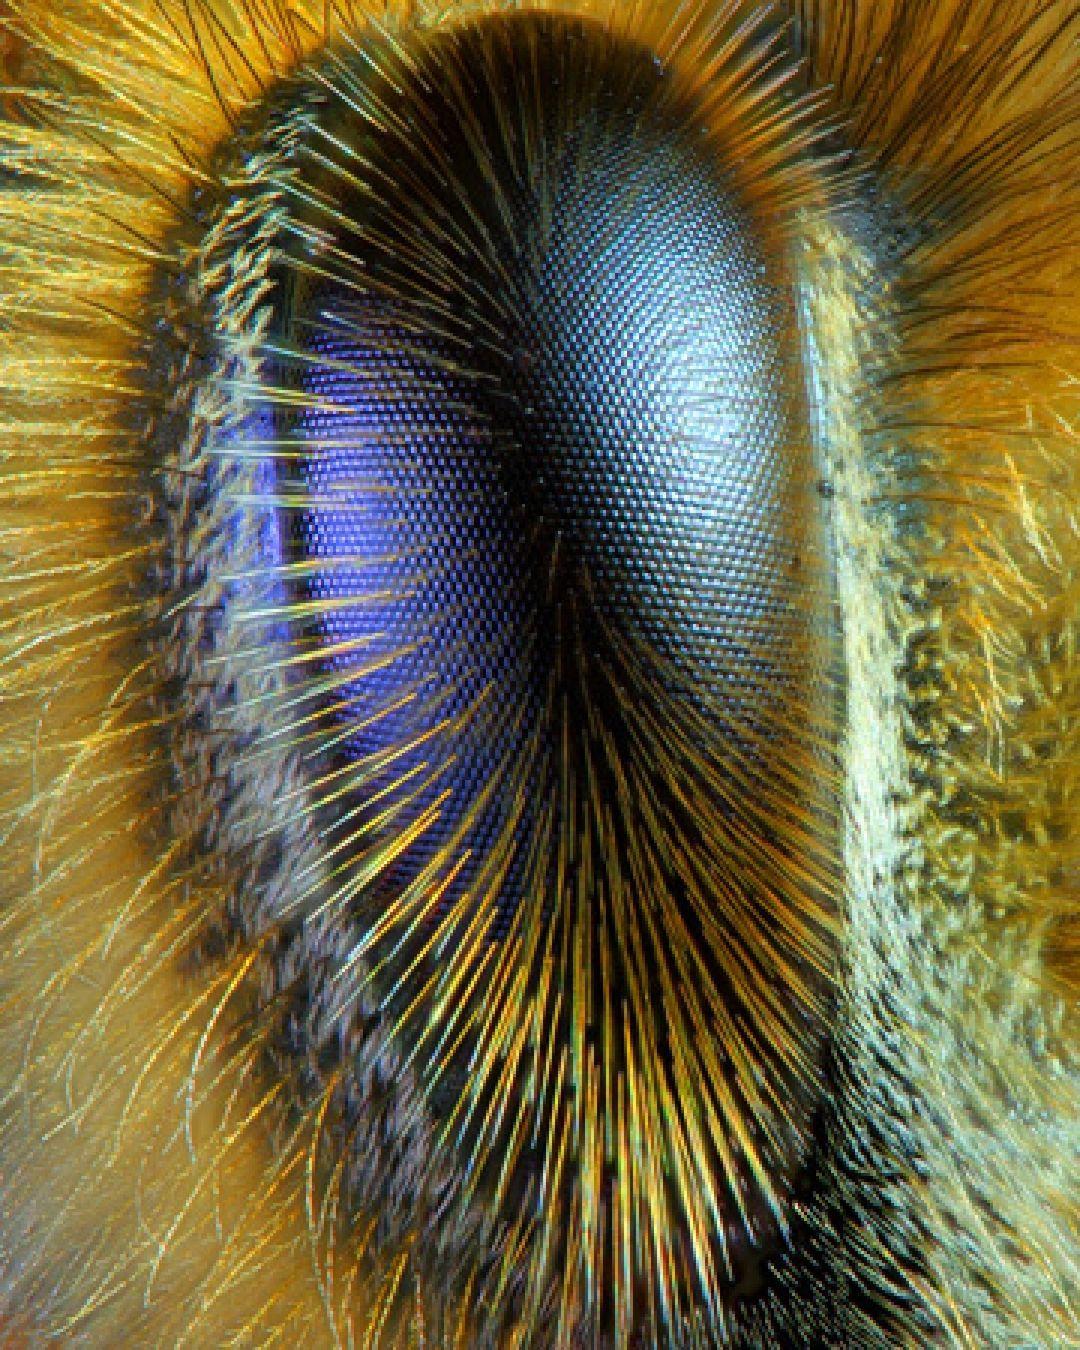 Honeybee eyes under the microscope